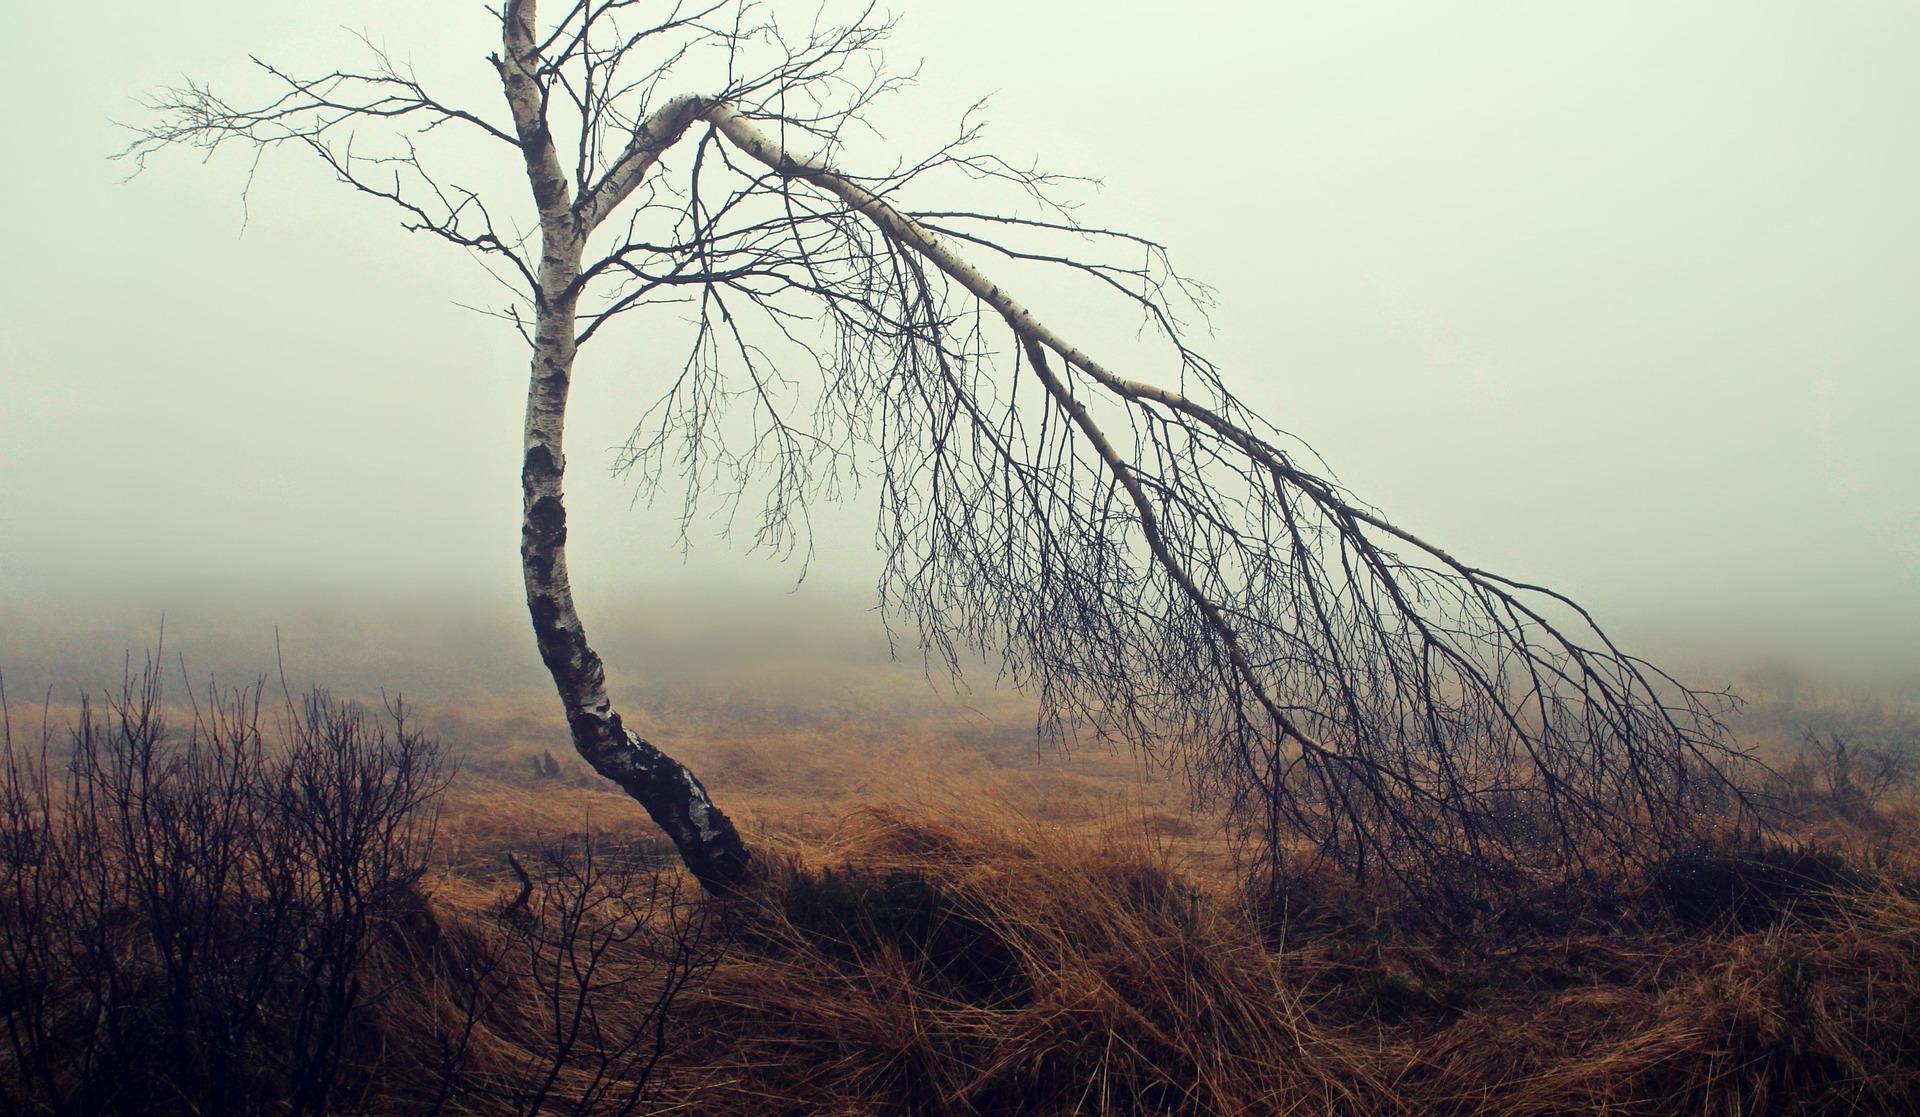 fog-1717410_1920.jpg